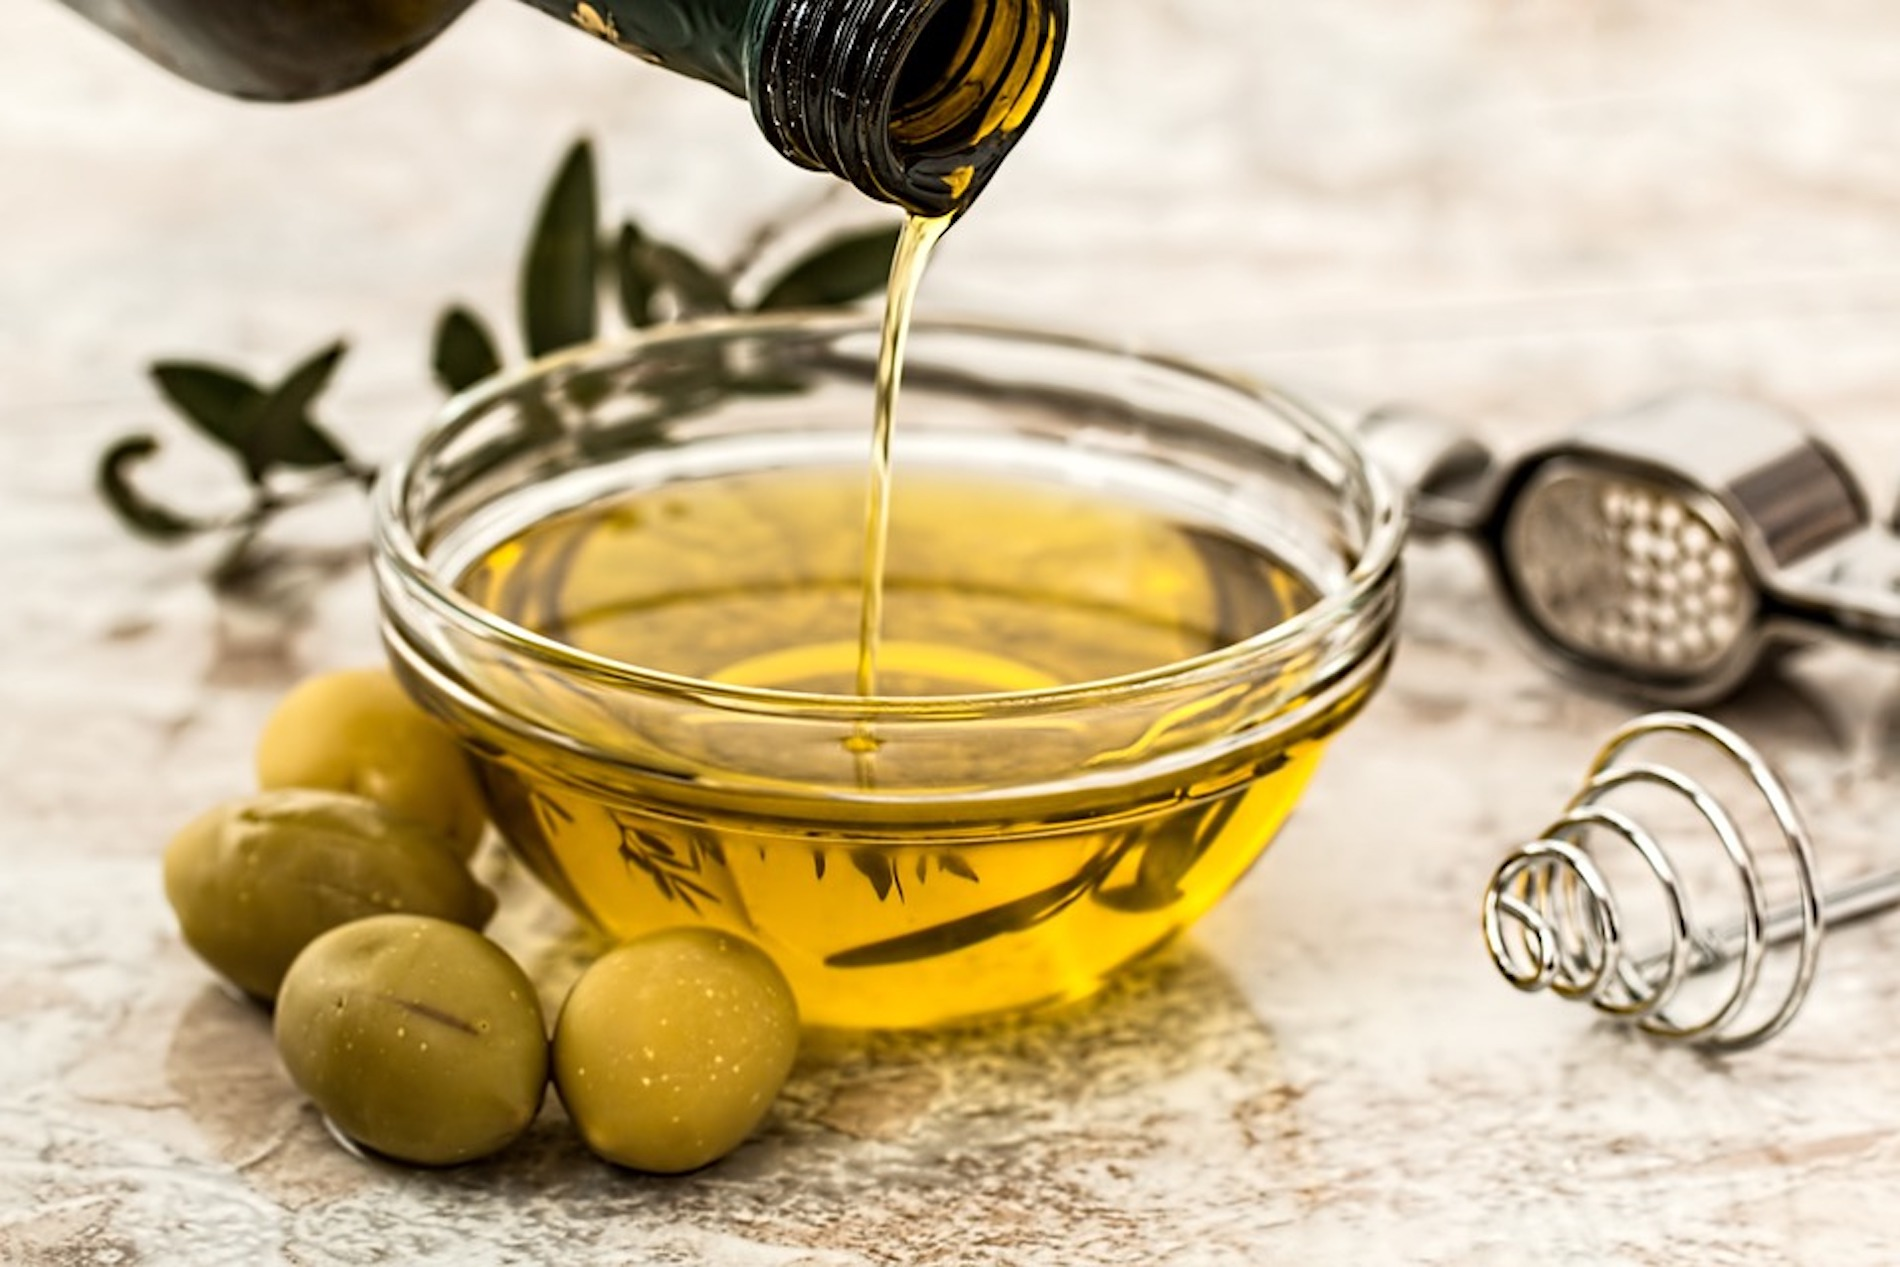 Extra virgin olive oil benefits